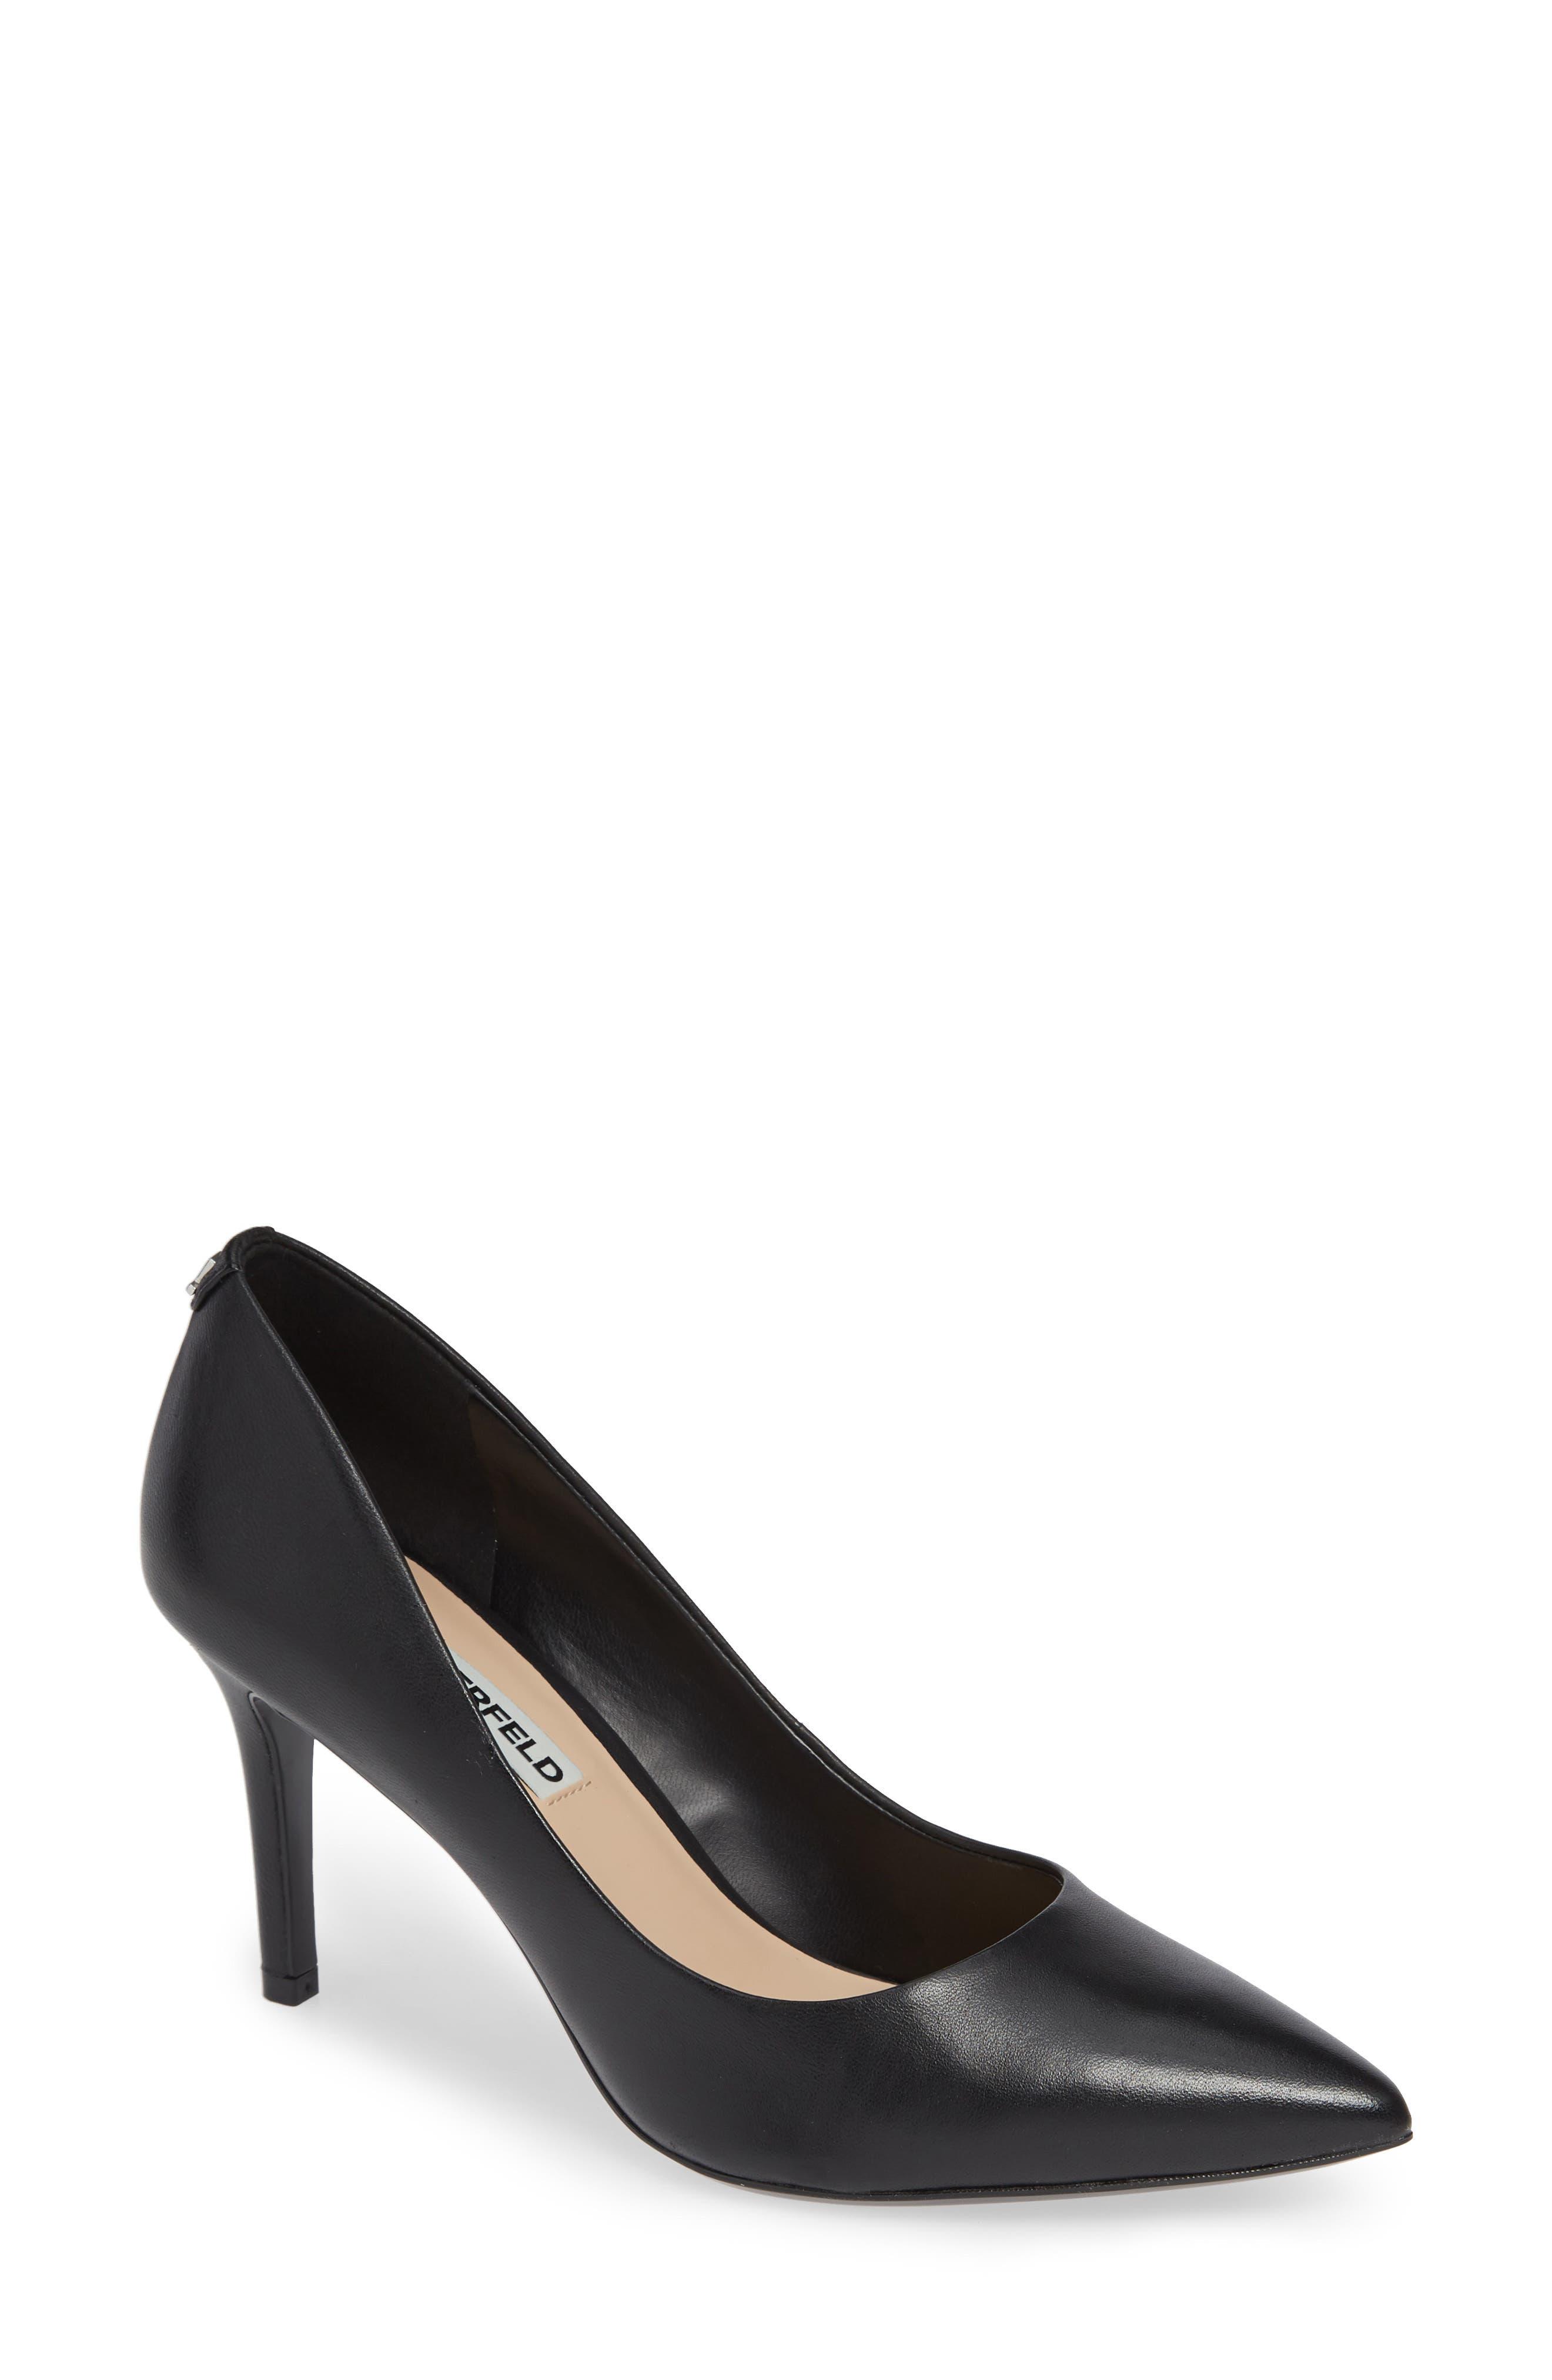 77cd07c7eb8 Women s Karl Lagerfeld Paris Shoes Under  100